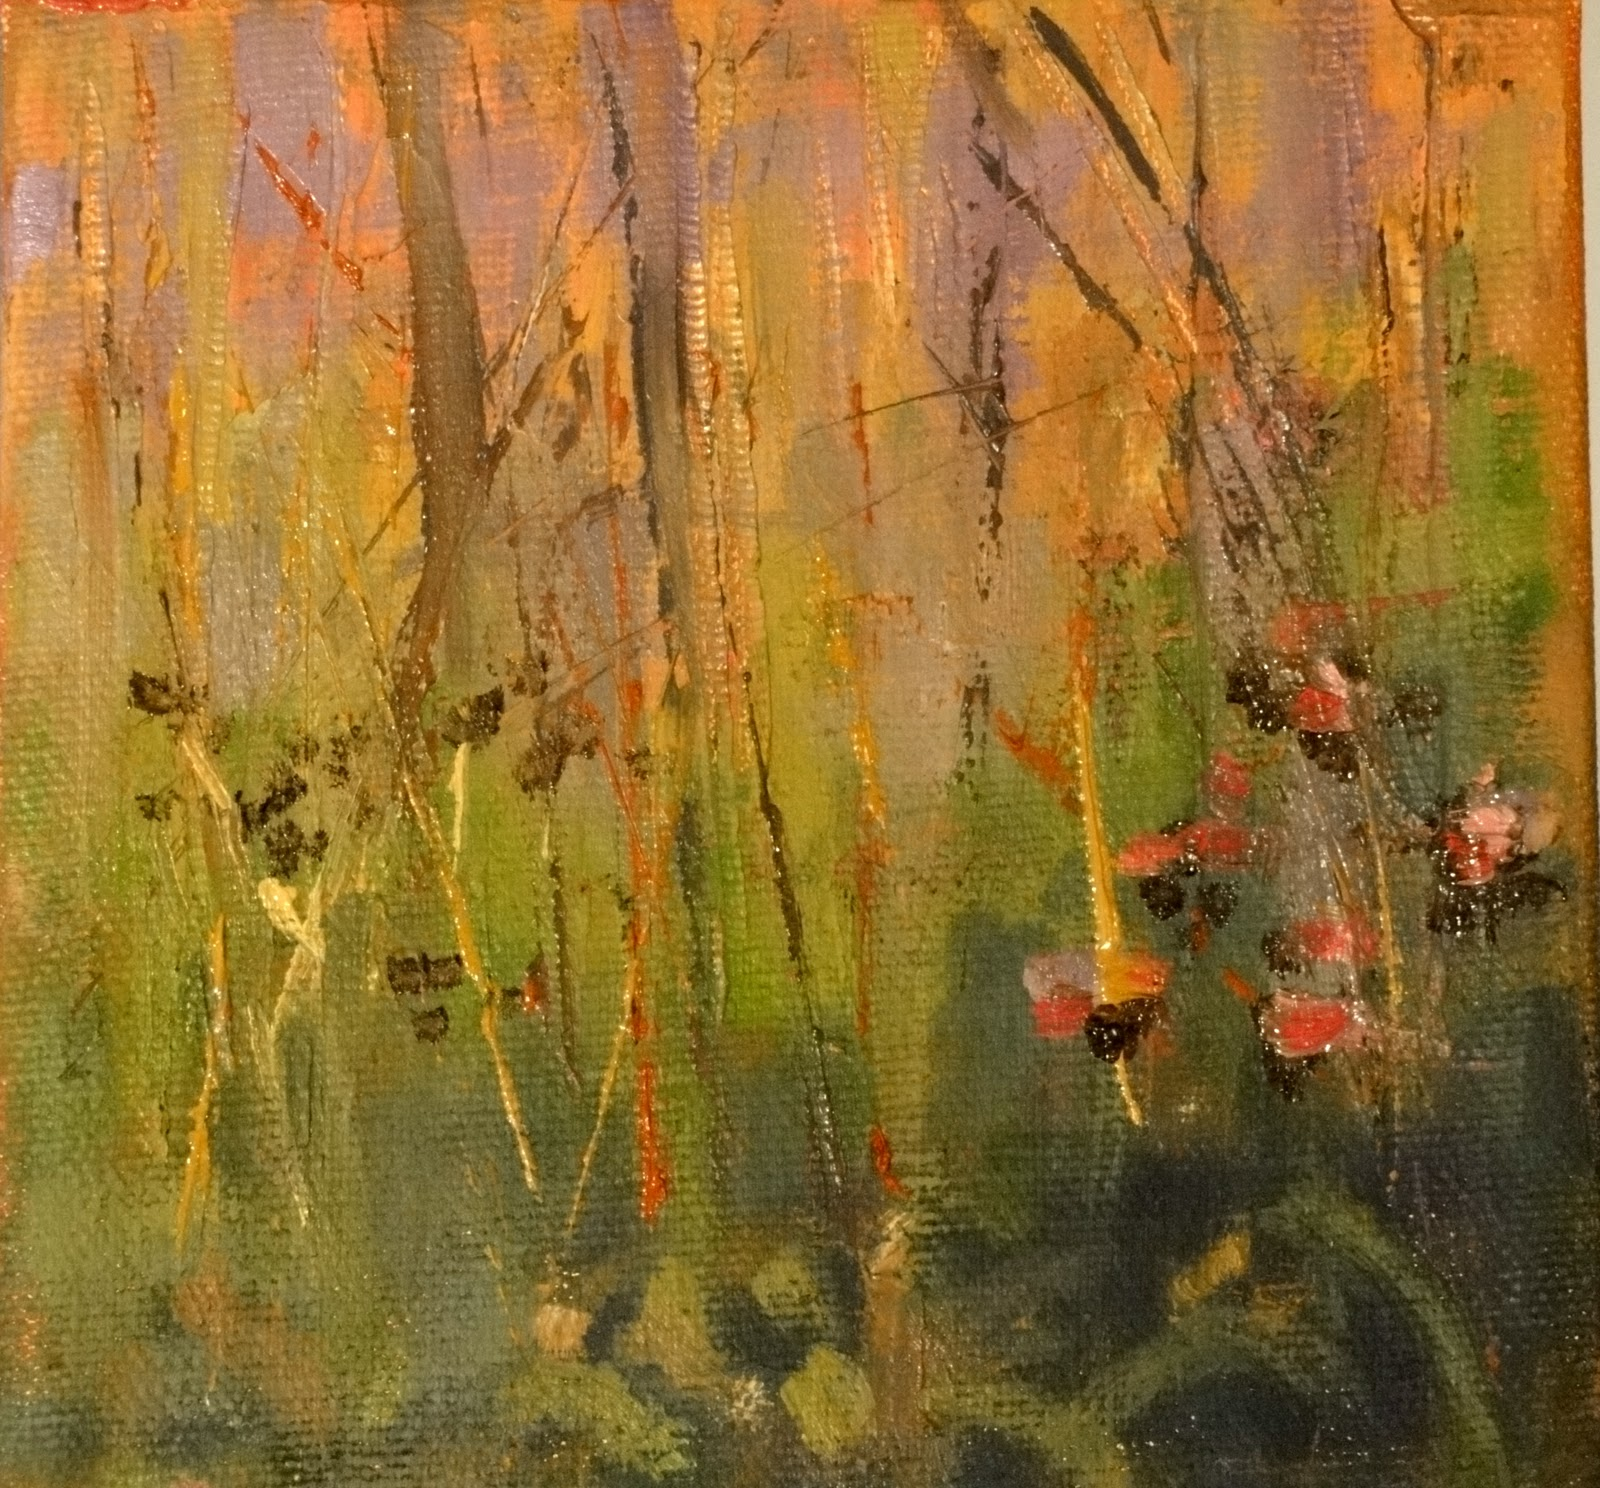 """Tall Grass Study, Crabtree Forest Preserve, 5x5 (Sold)"" original fine art by Ann Feldman"